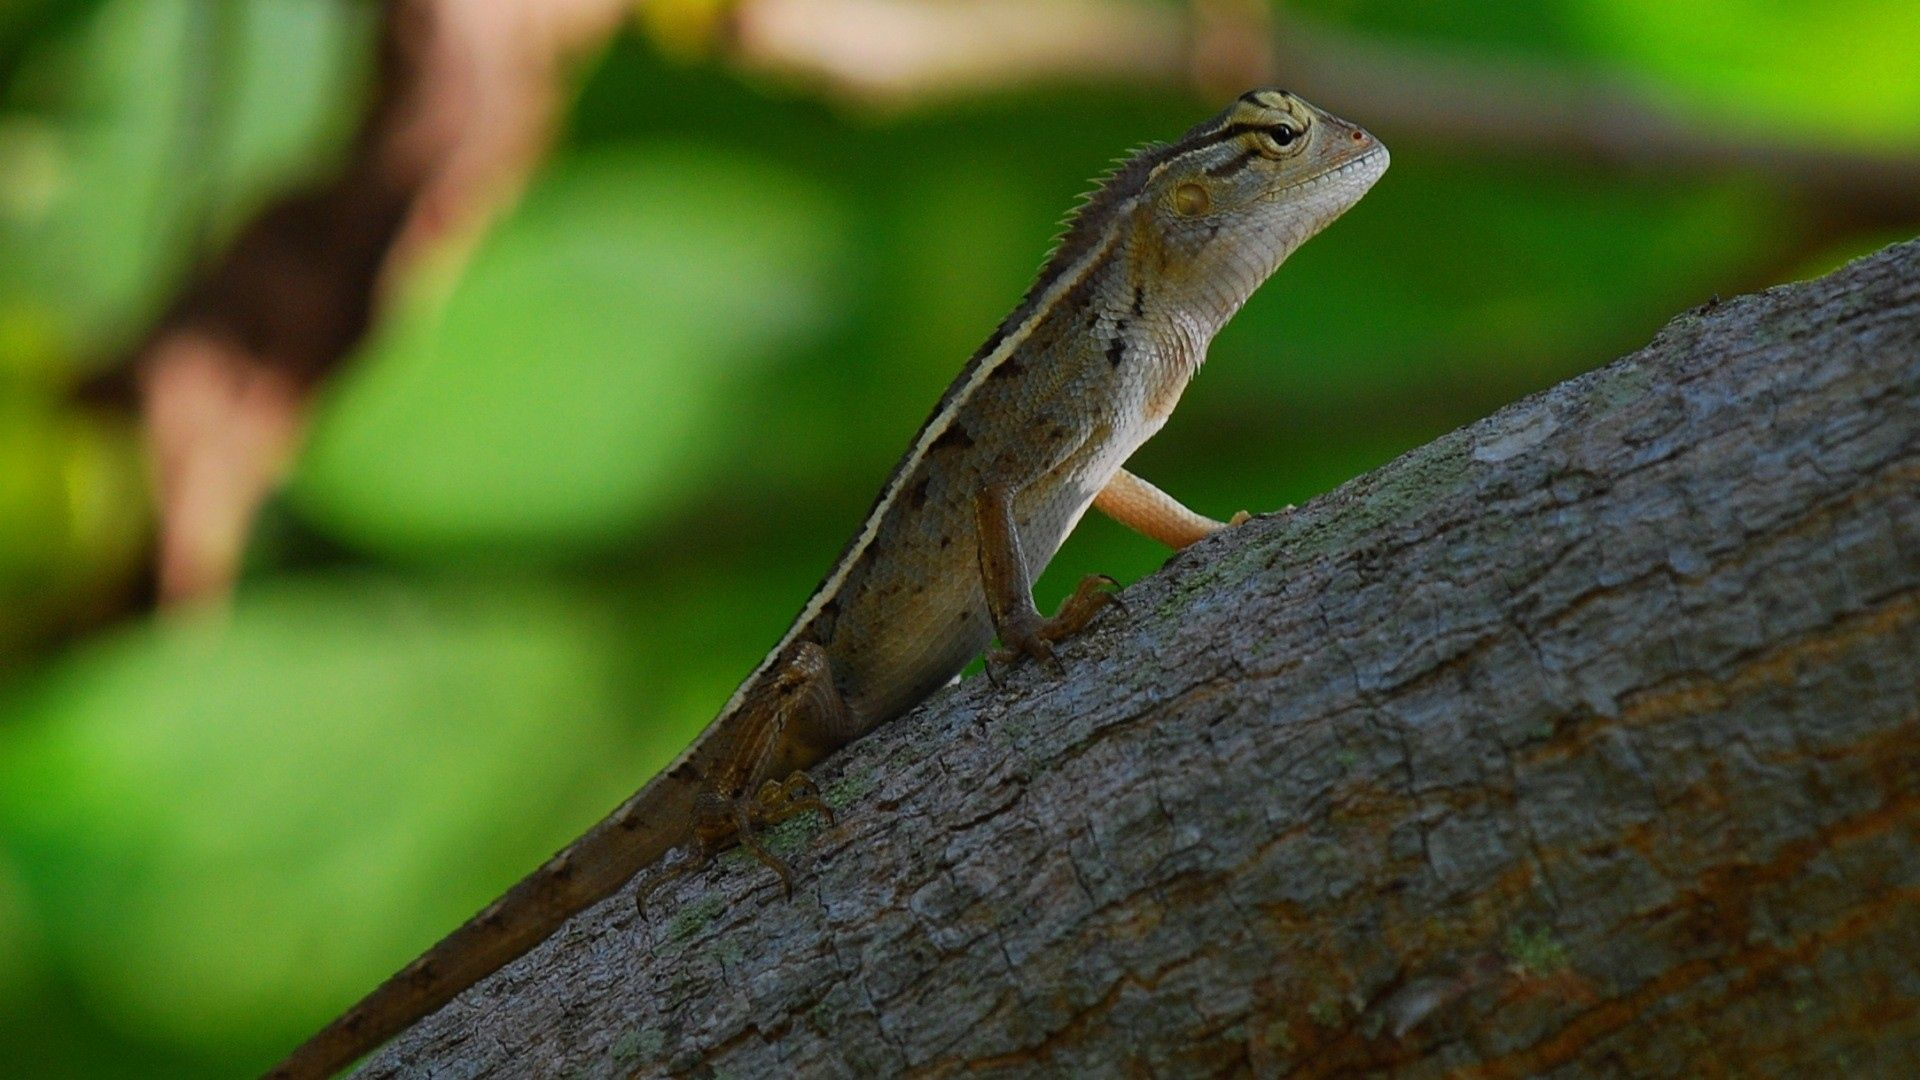 Arboreal Lizards Photos